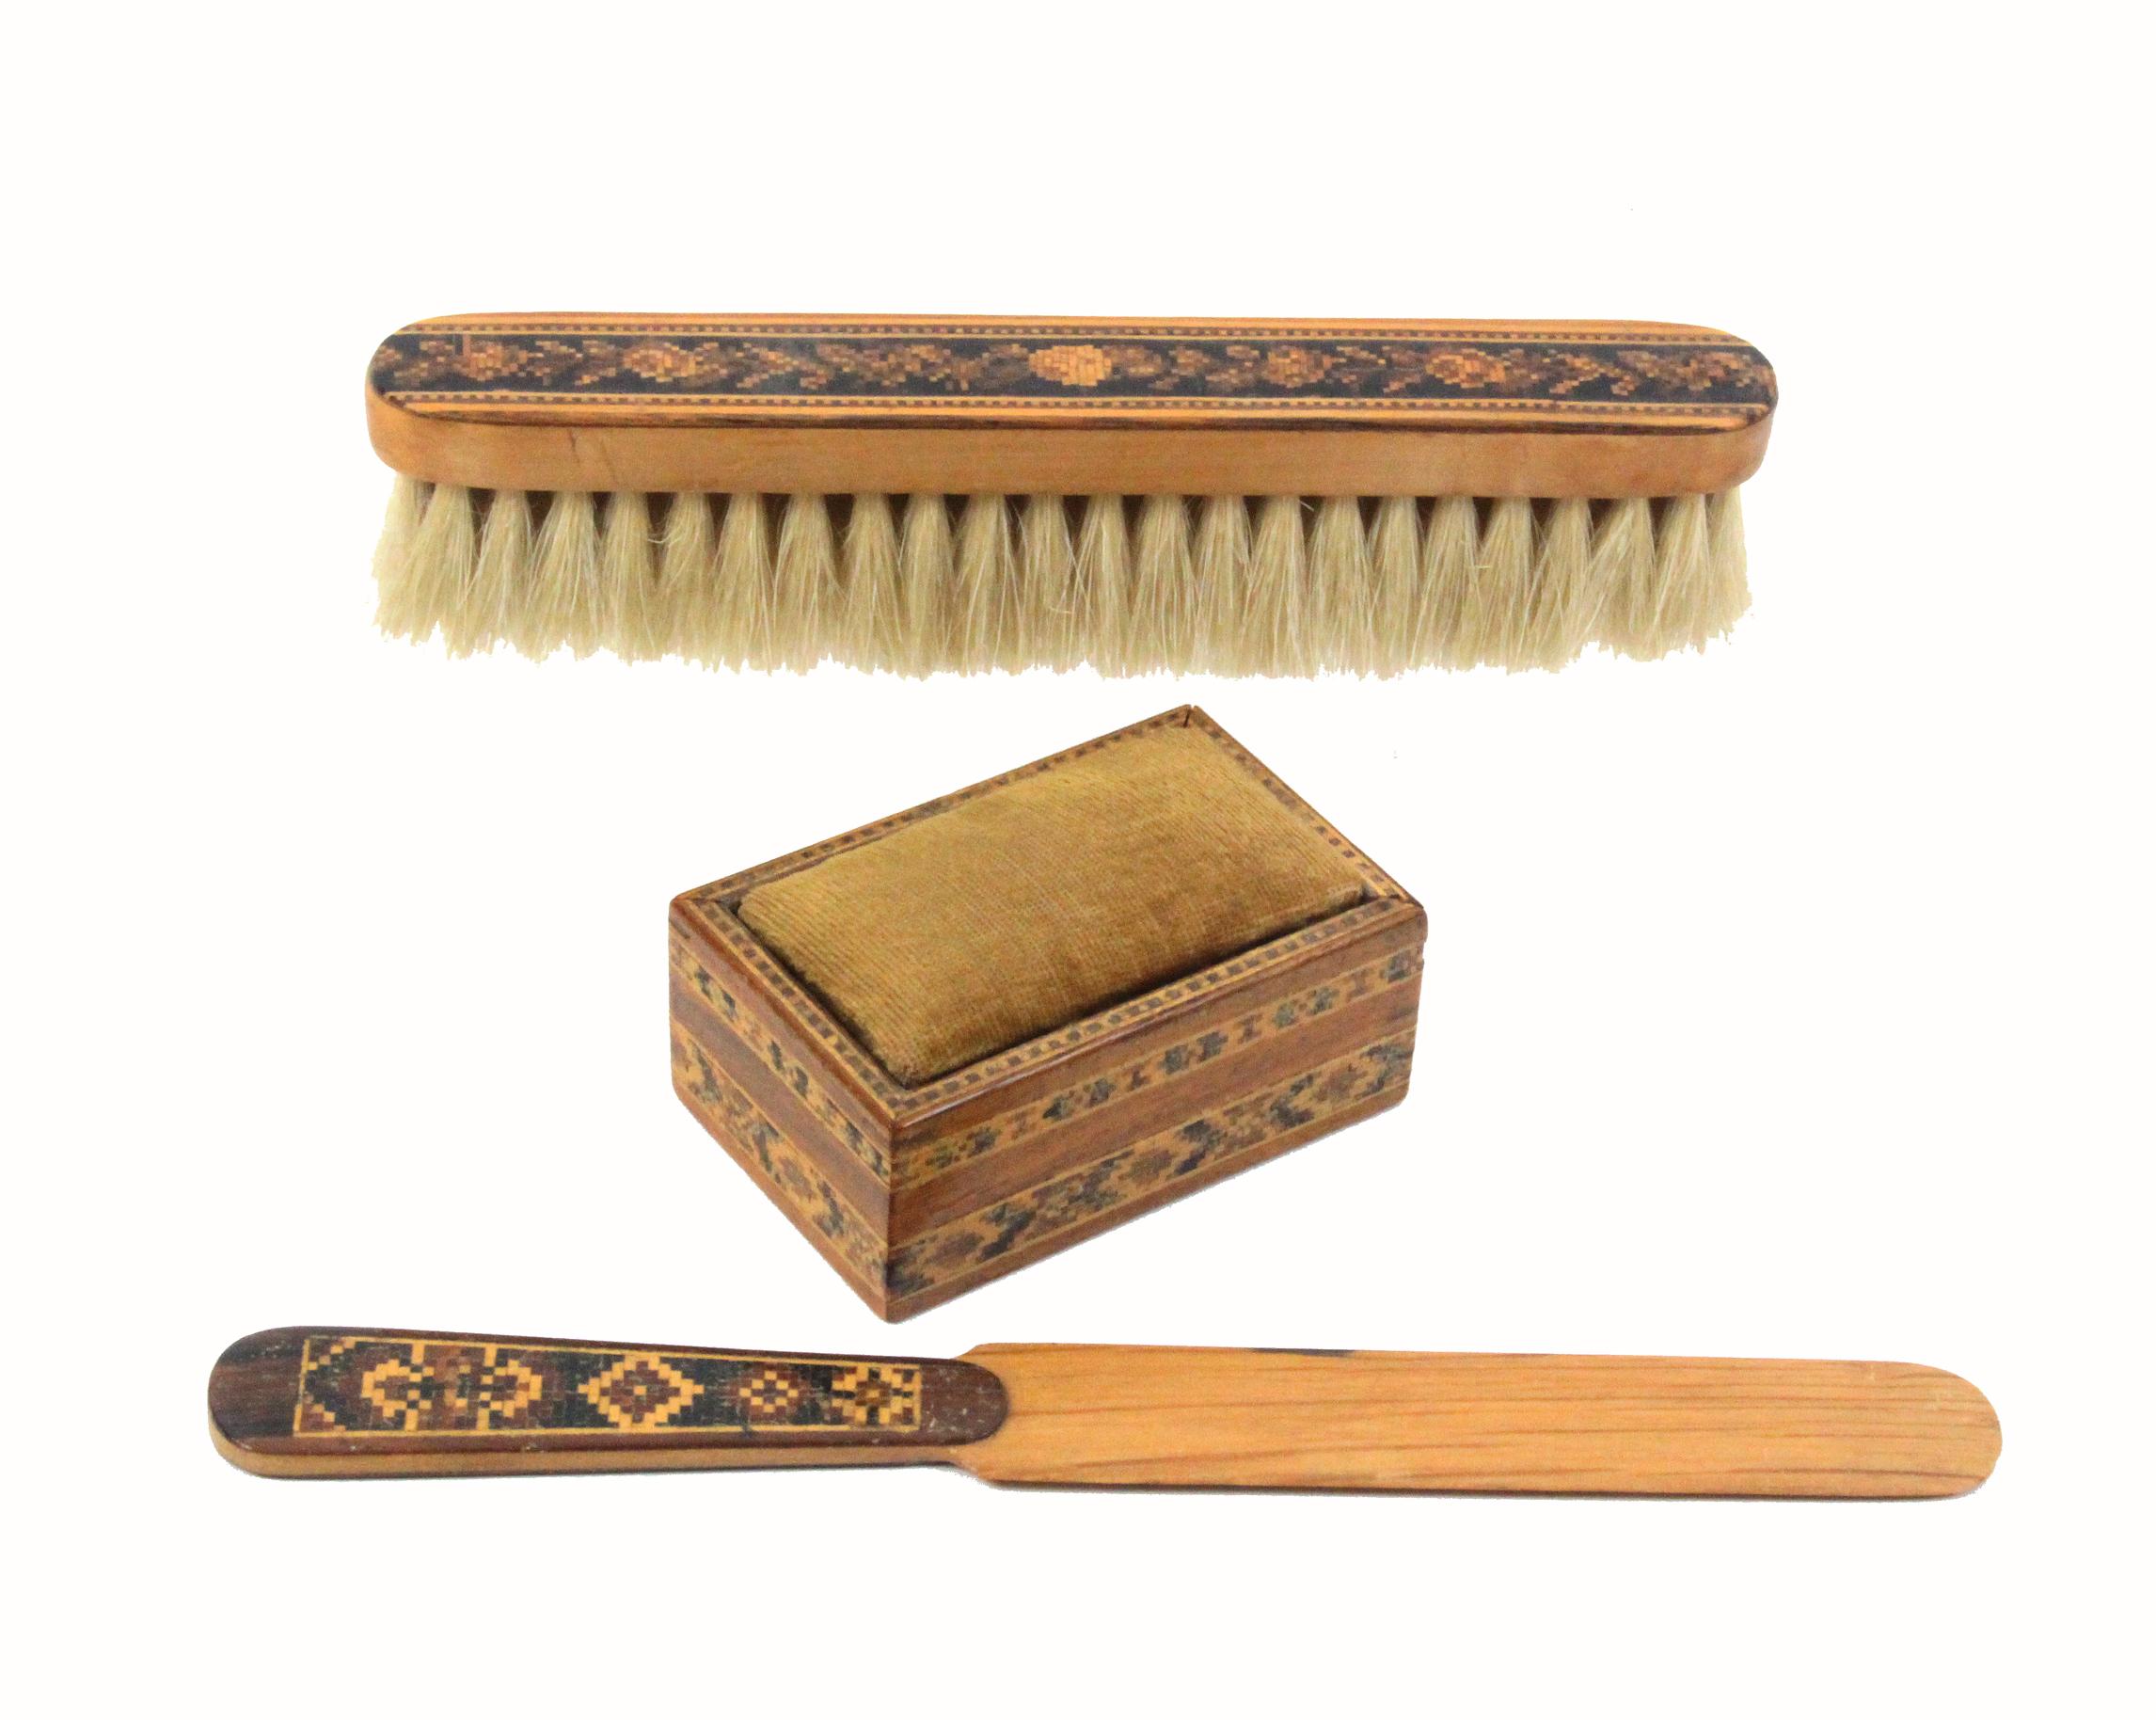 Three pieces of Tunbridge ware comprising a brush, 16.7cm, a rectangular box with sliding pin